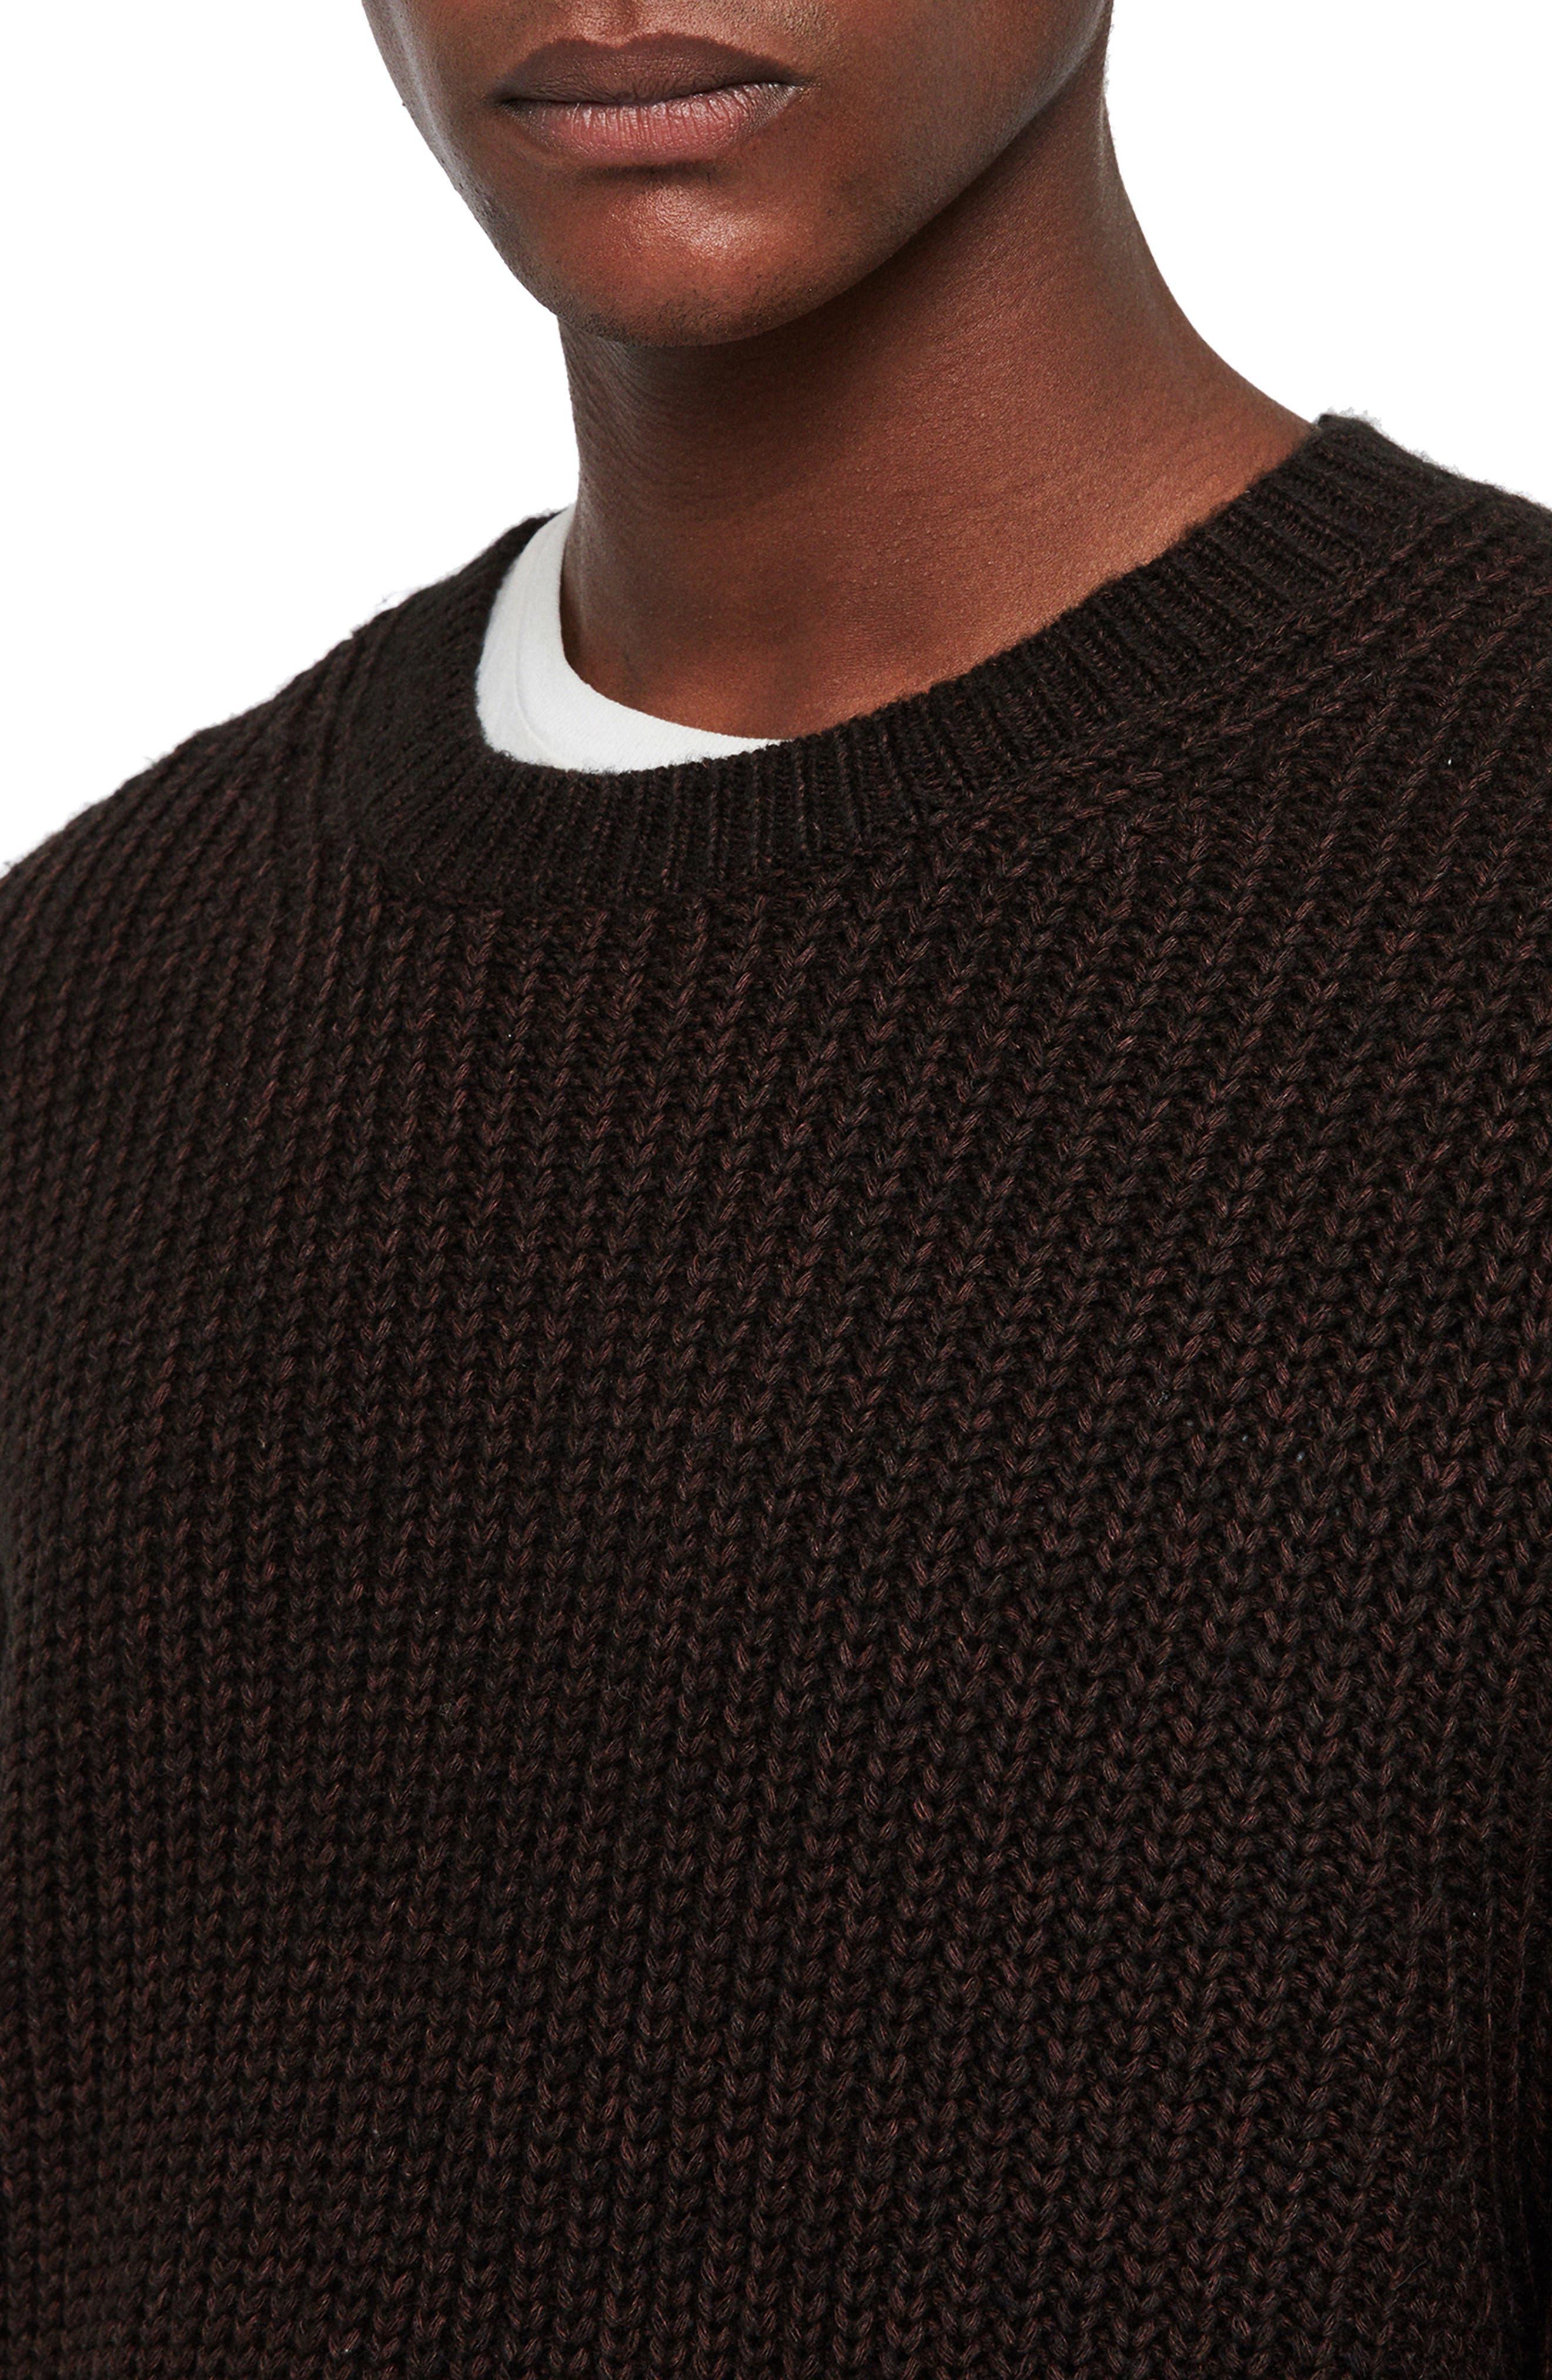 Tilman Regular Fit Sweater,                             Alternate thumbnail 4, color,                             001